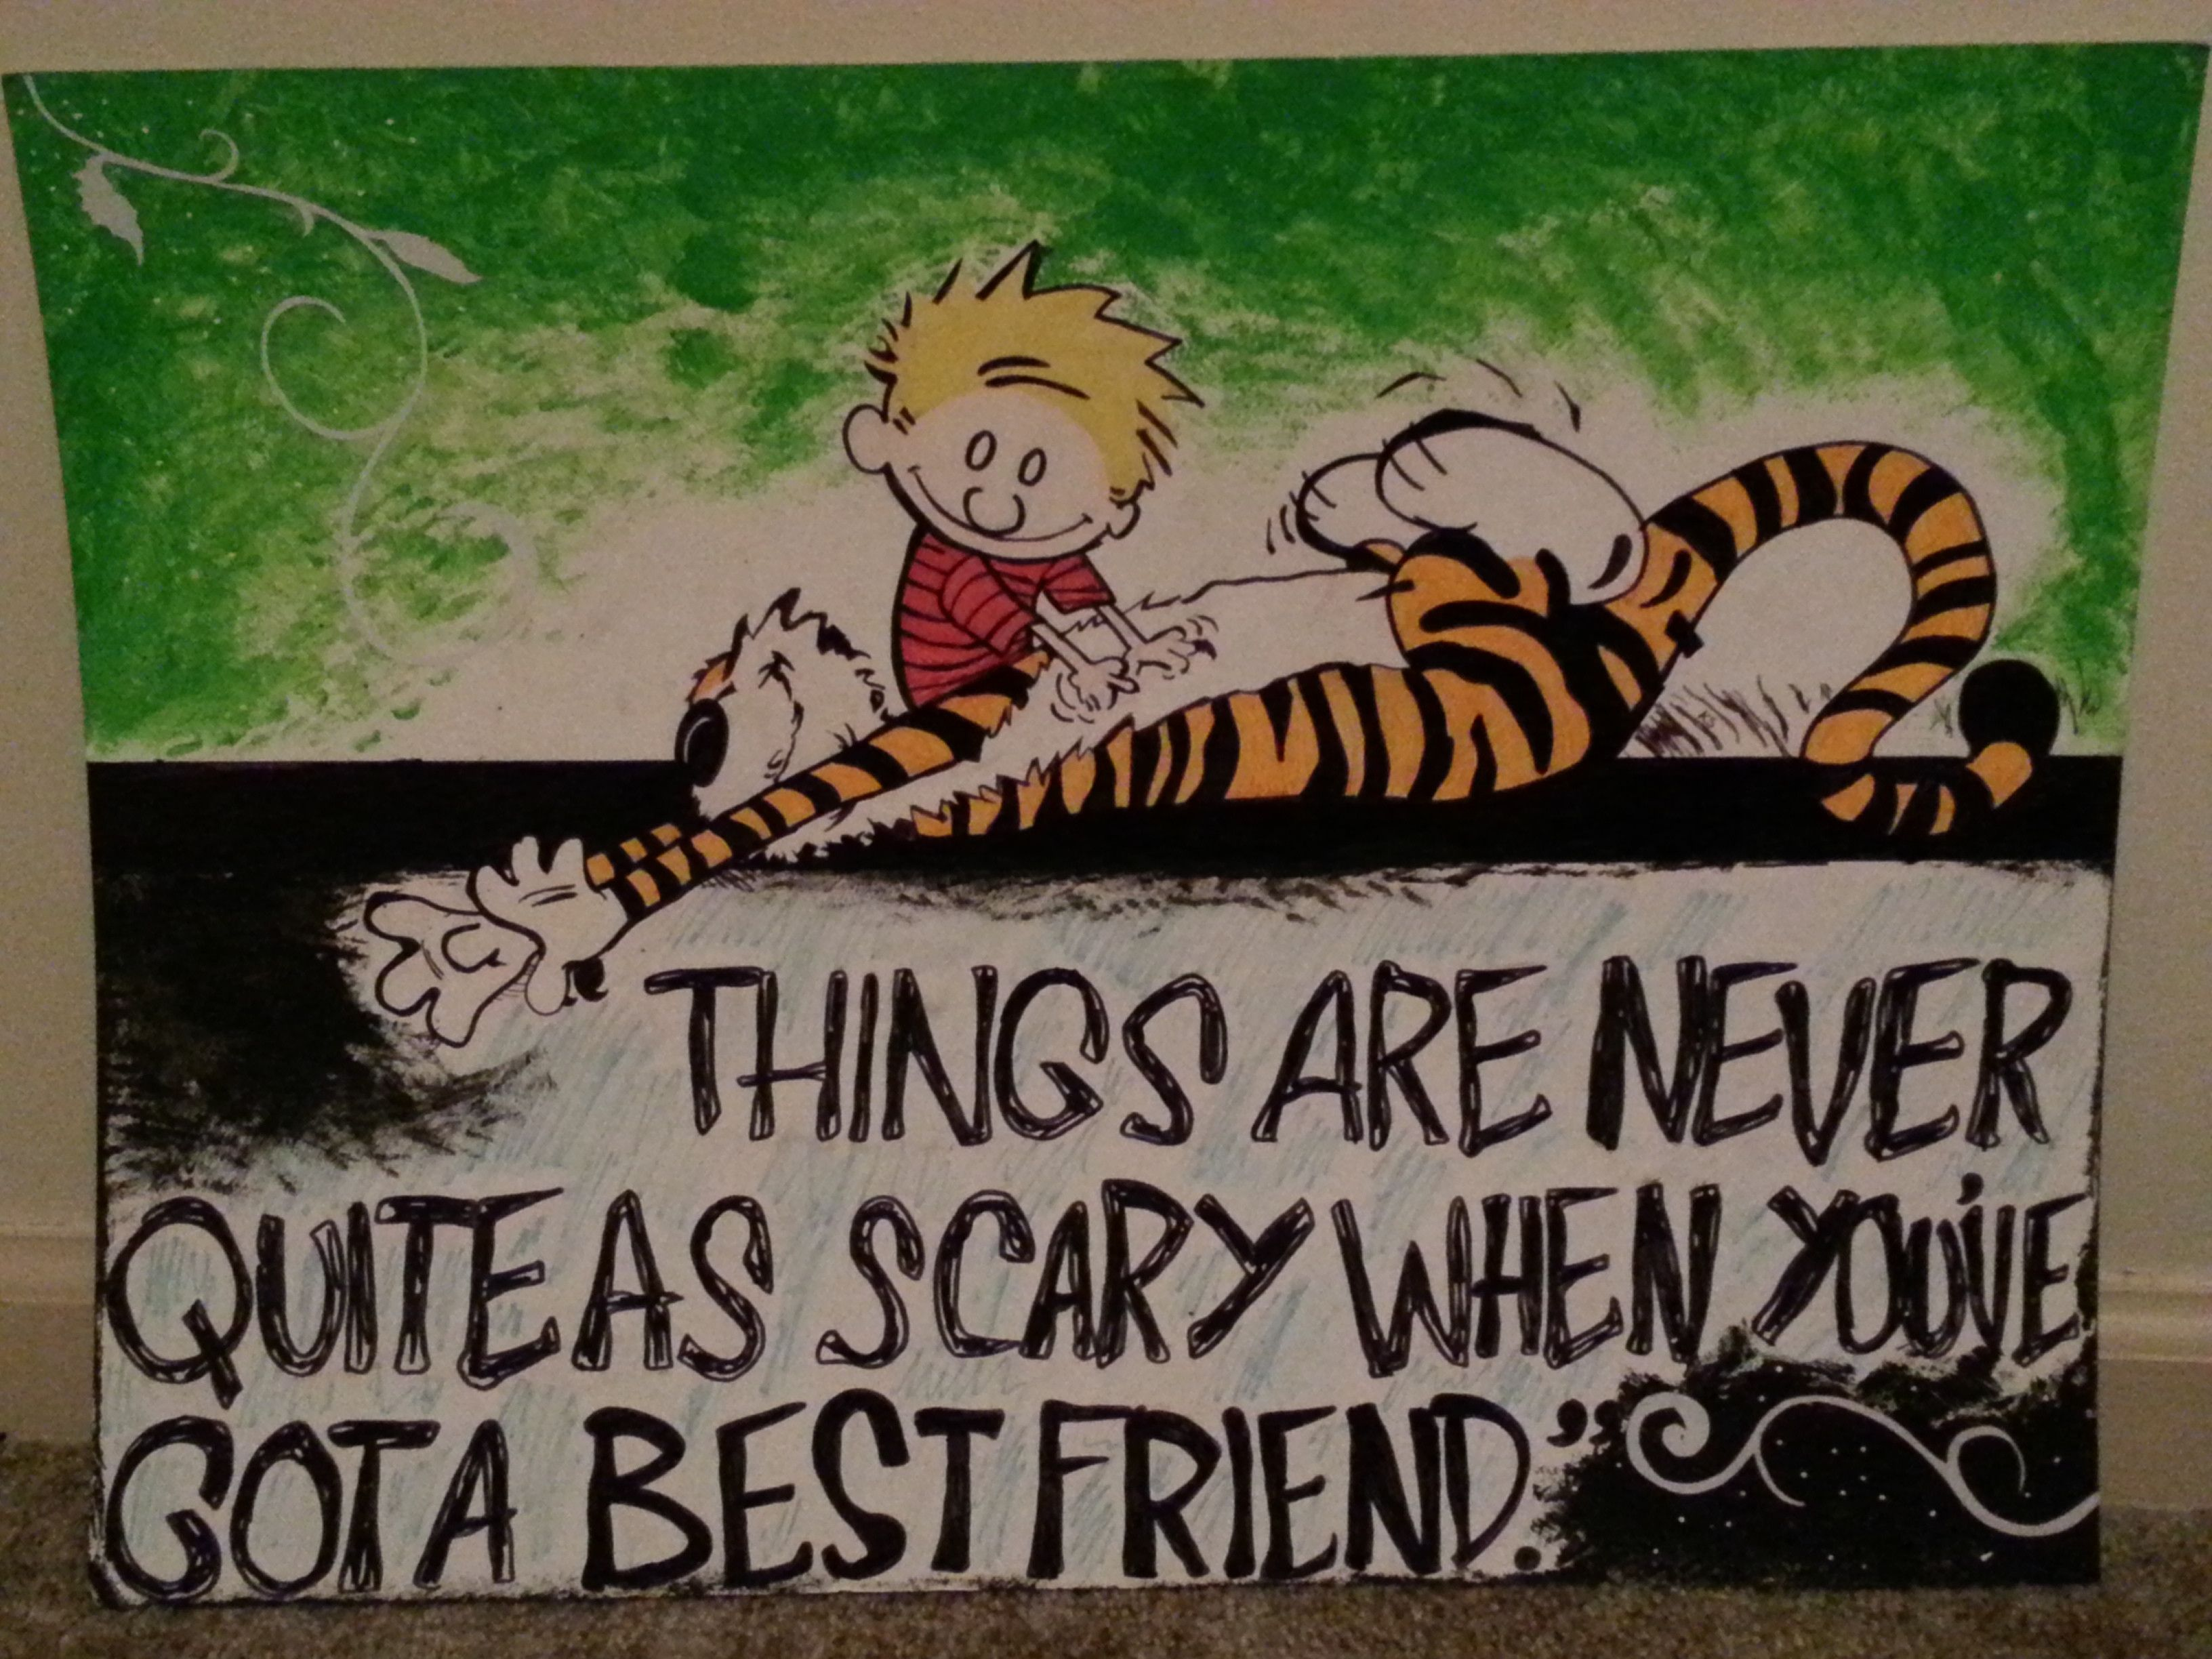 Explore Bestest Friend, Best Friends, And More!